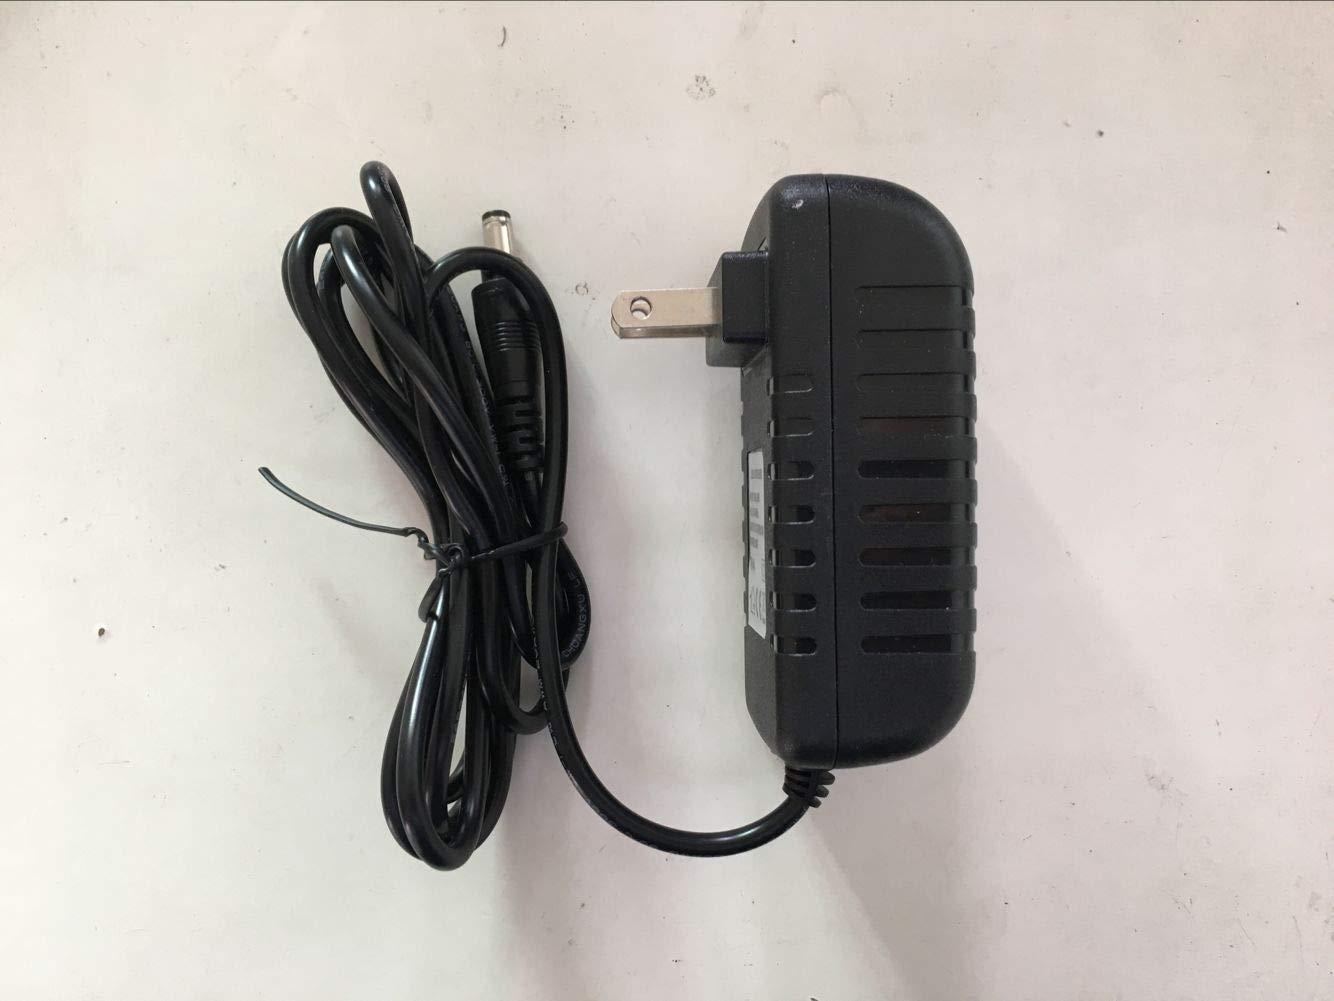 Grow Light Power Adapter 2-pin for Aceple Light Fixture Only